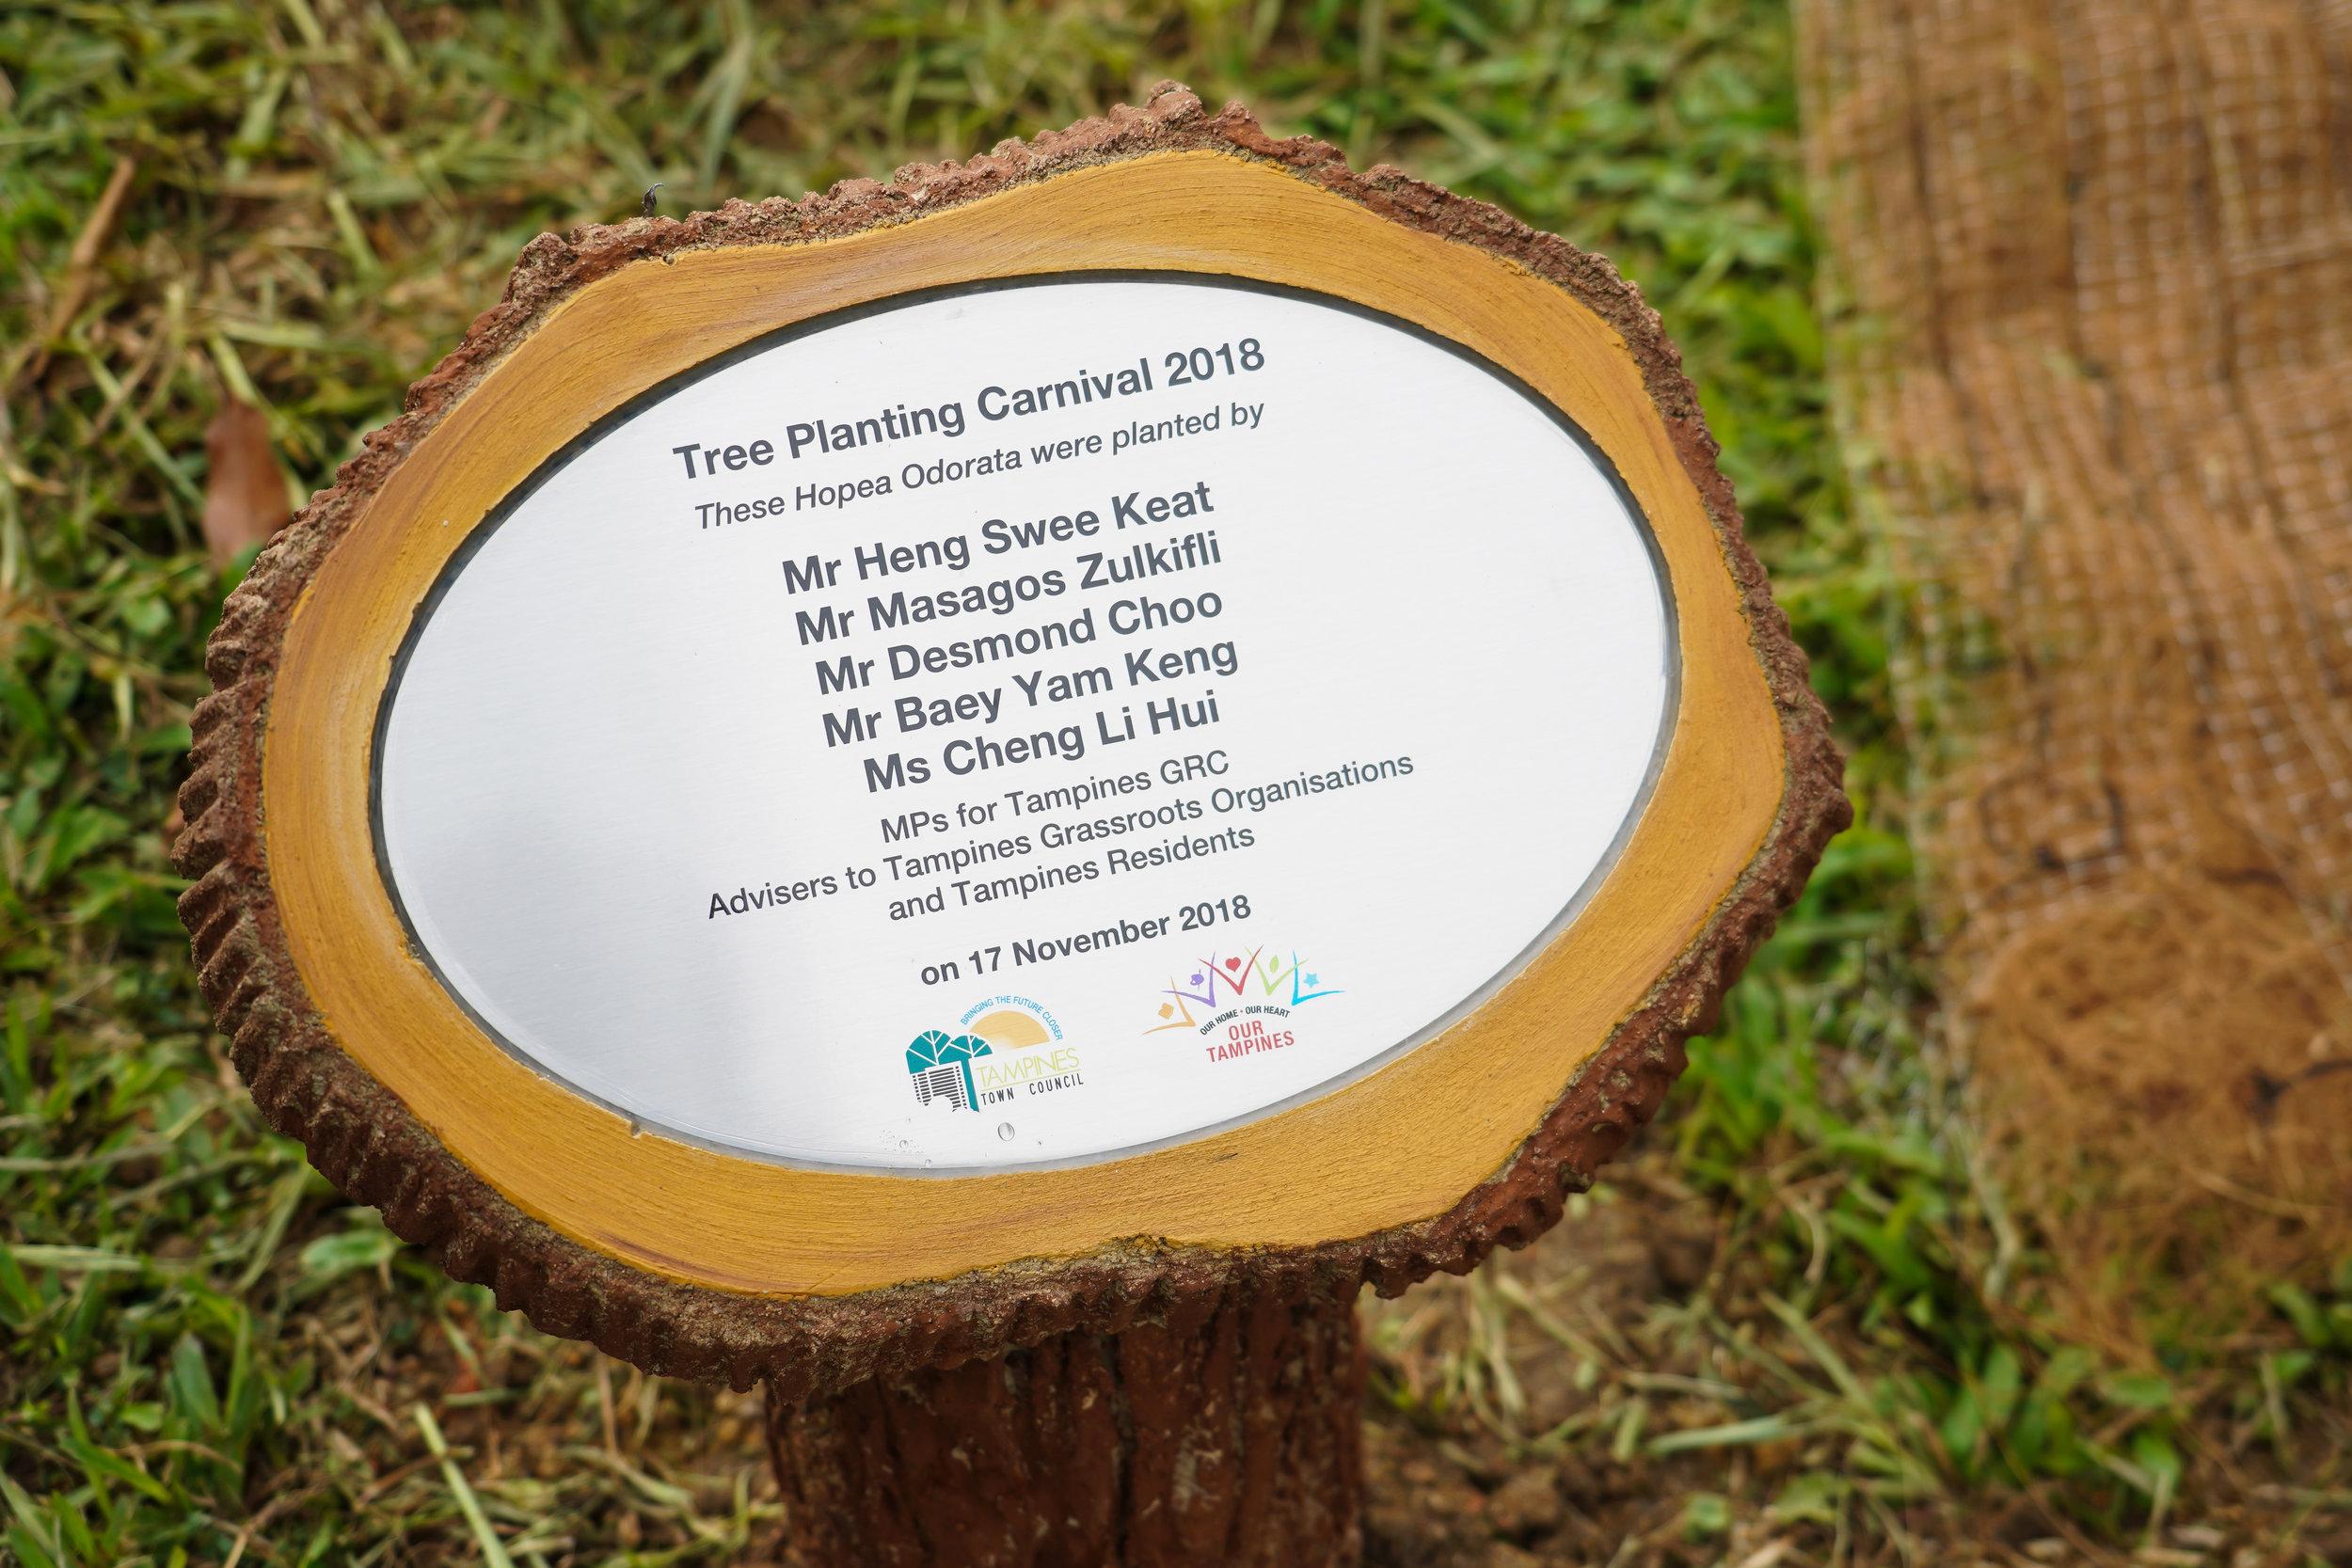 Tree Planting 2018 - 117 of 160.jpg